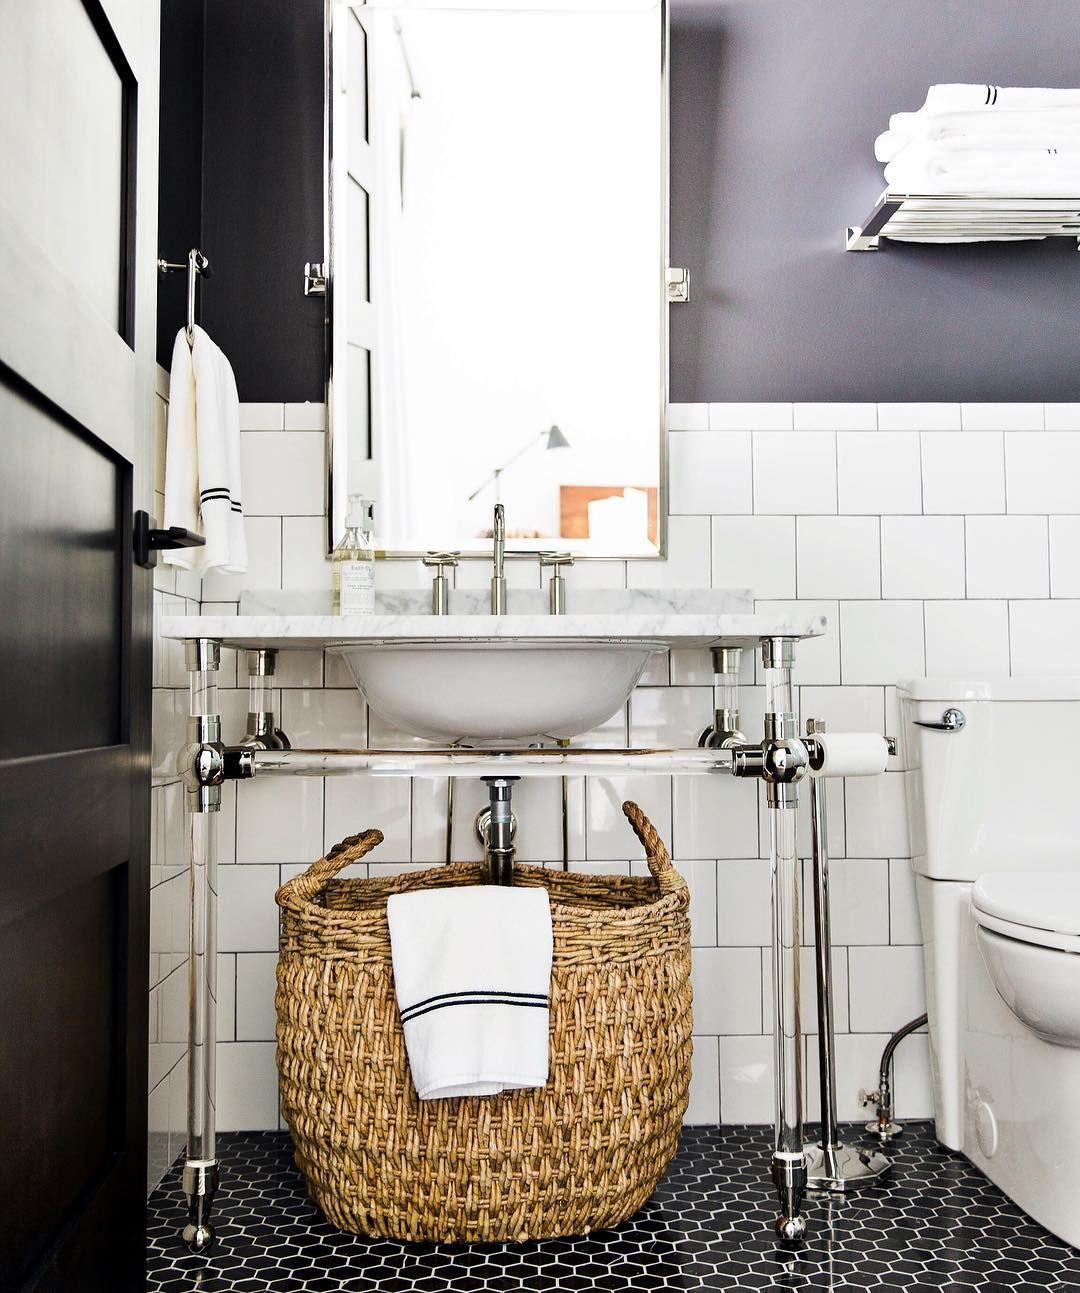 Classic White Subway Tile Bathroom: Black And White Bathroom Inspiration • Studio McGee • Www